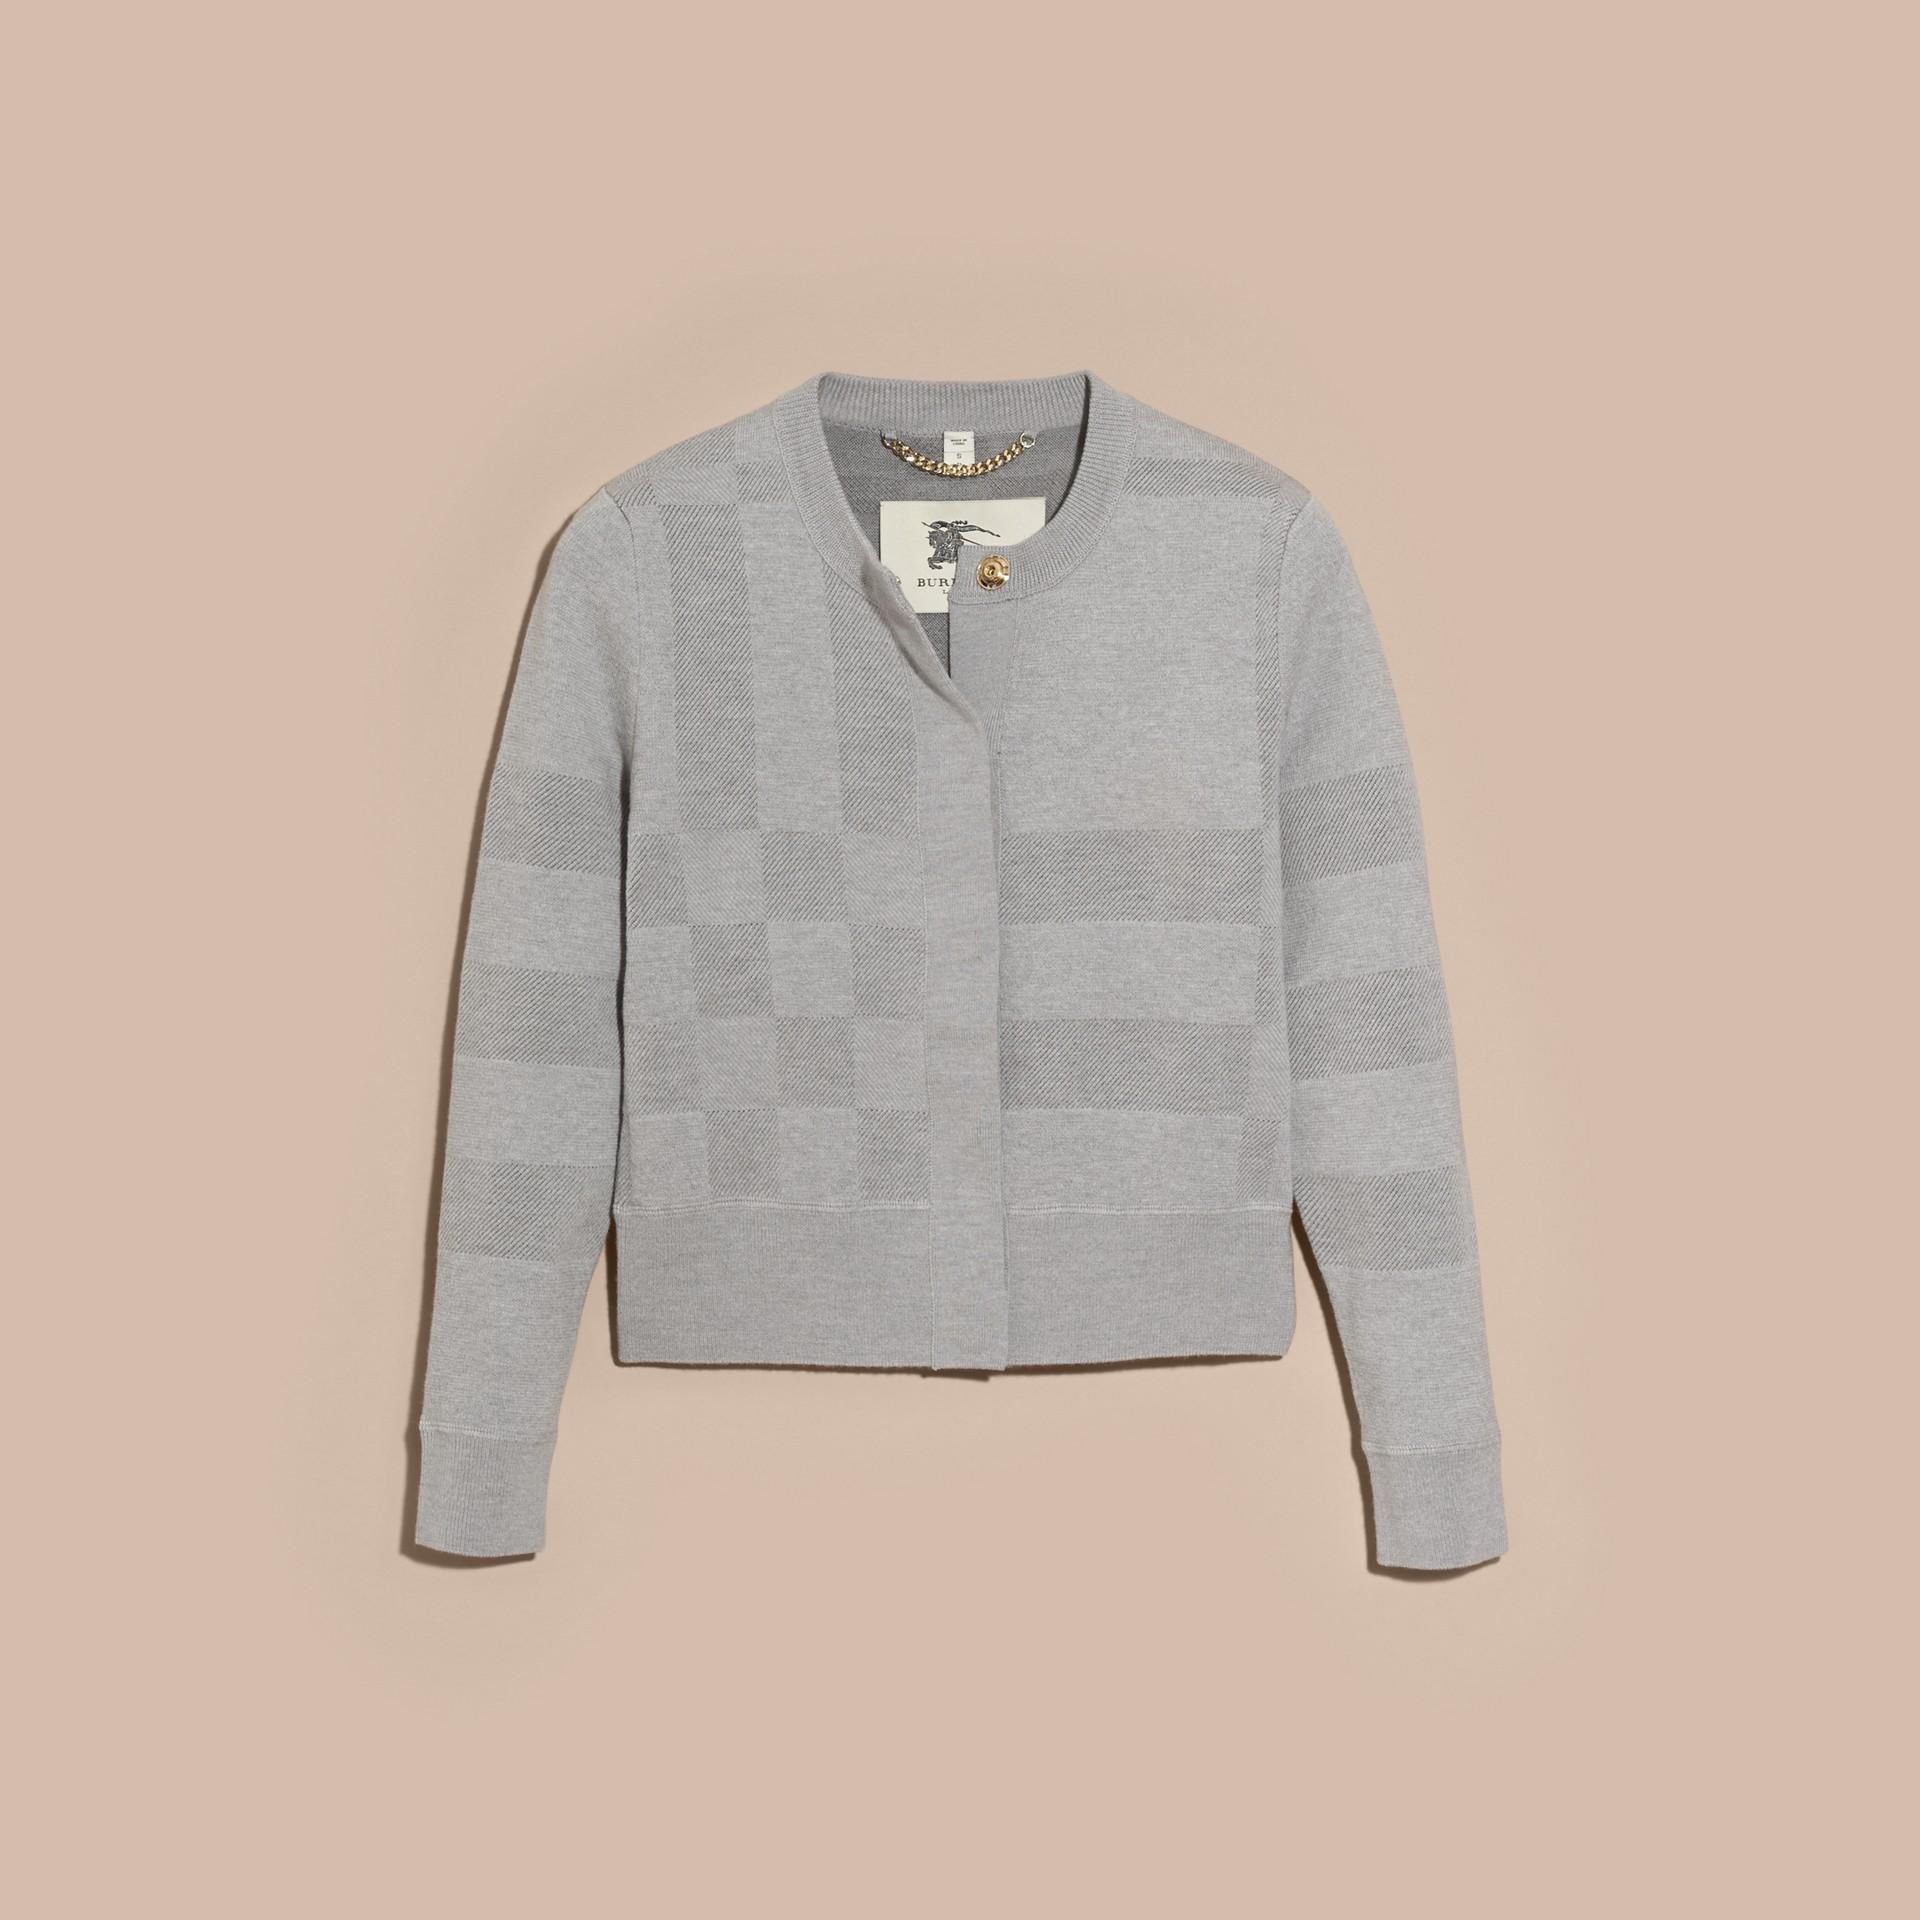 Mid grey melange Check Knit Wool Blend Cardigan - gallery image 3